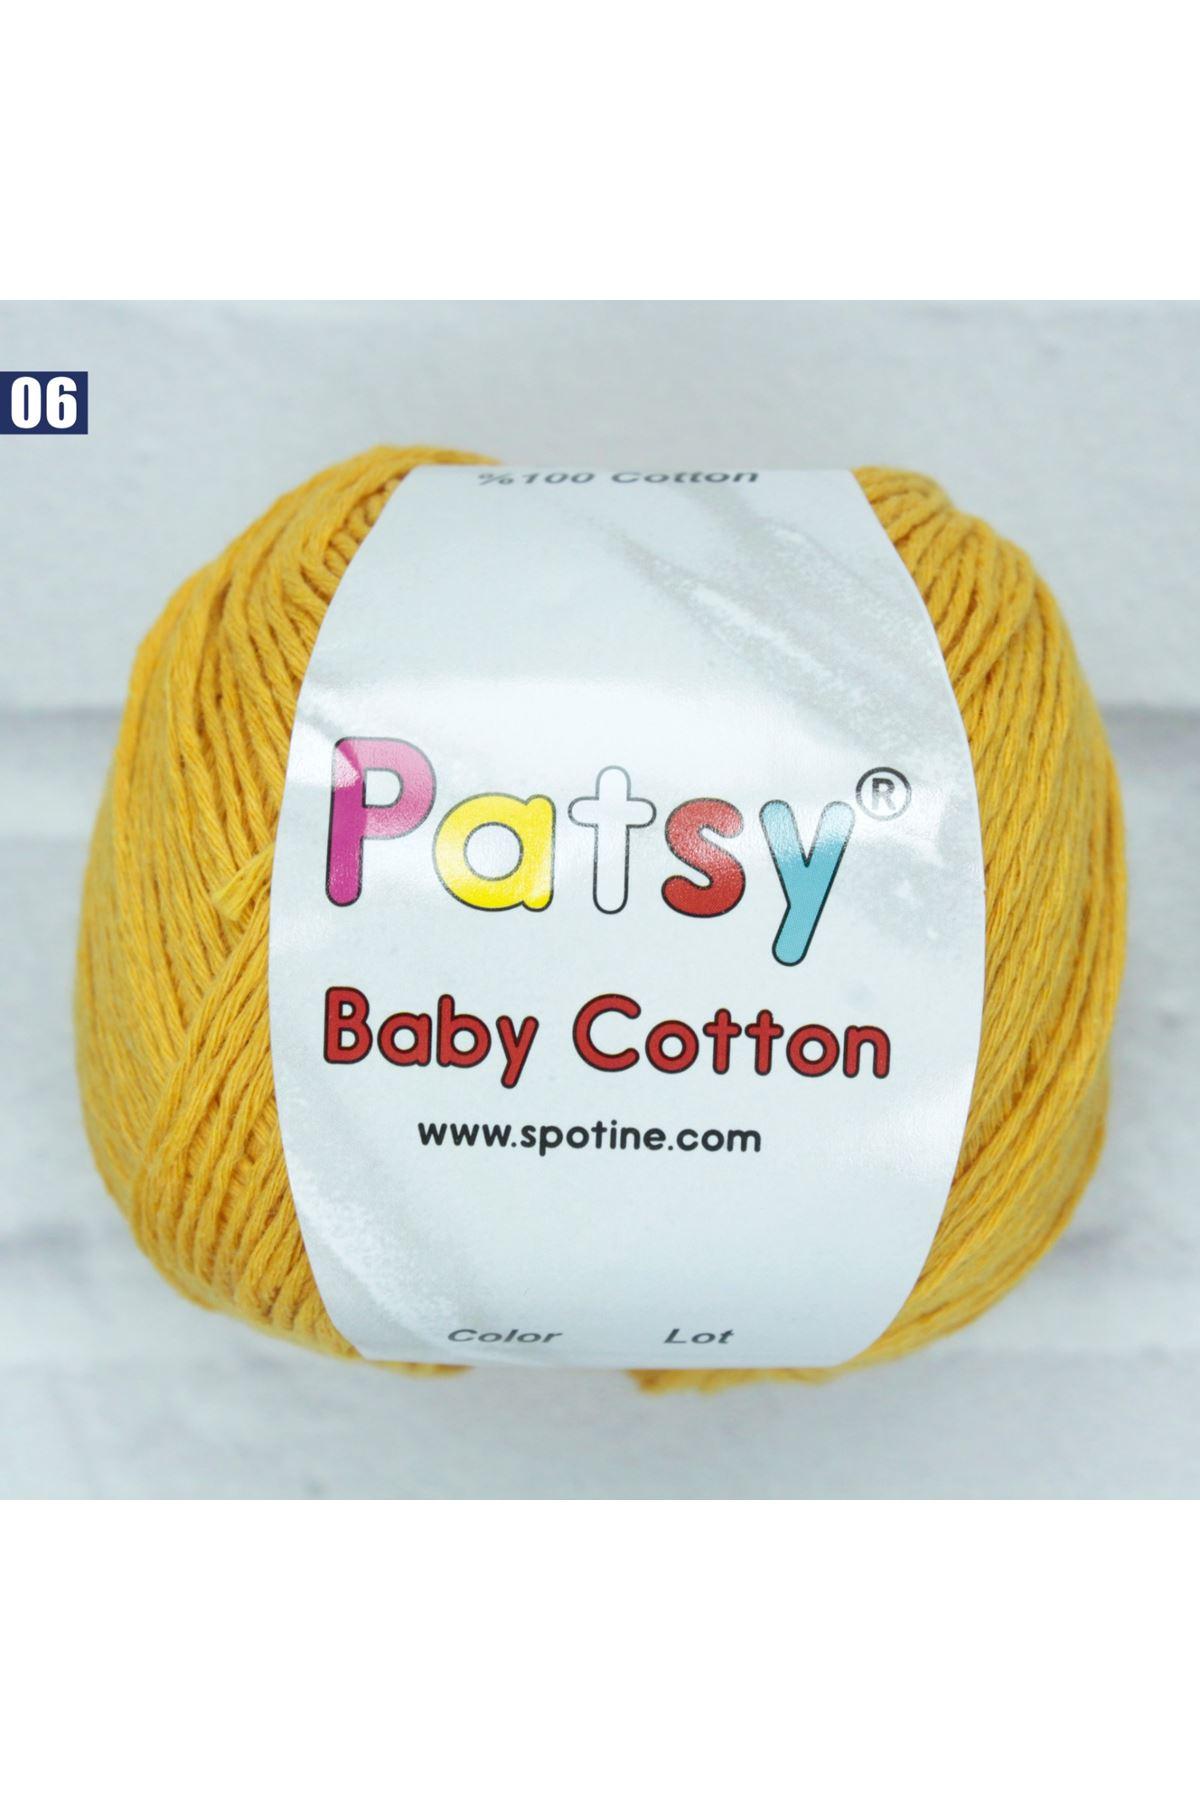 Patsy Baby Cotton 06